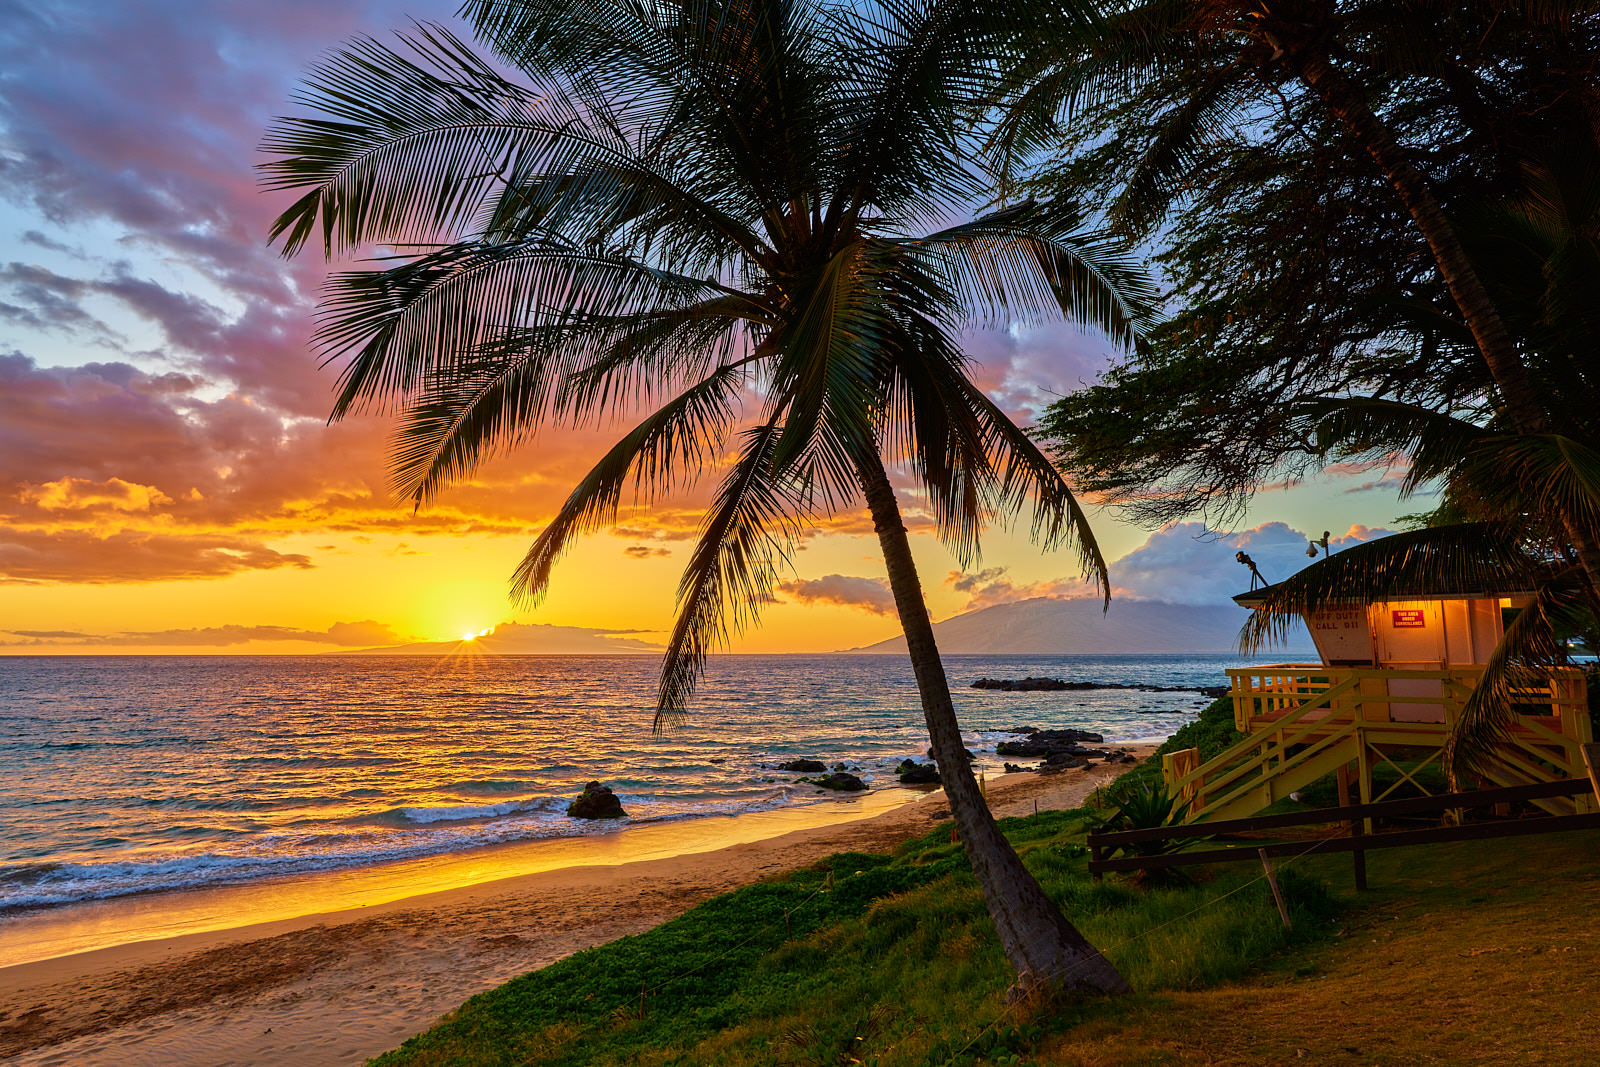 sunset along kamaole 3 beach in Kihei featuring a coconut palm tree and lifeguard shack